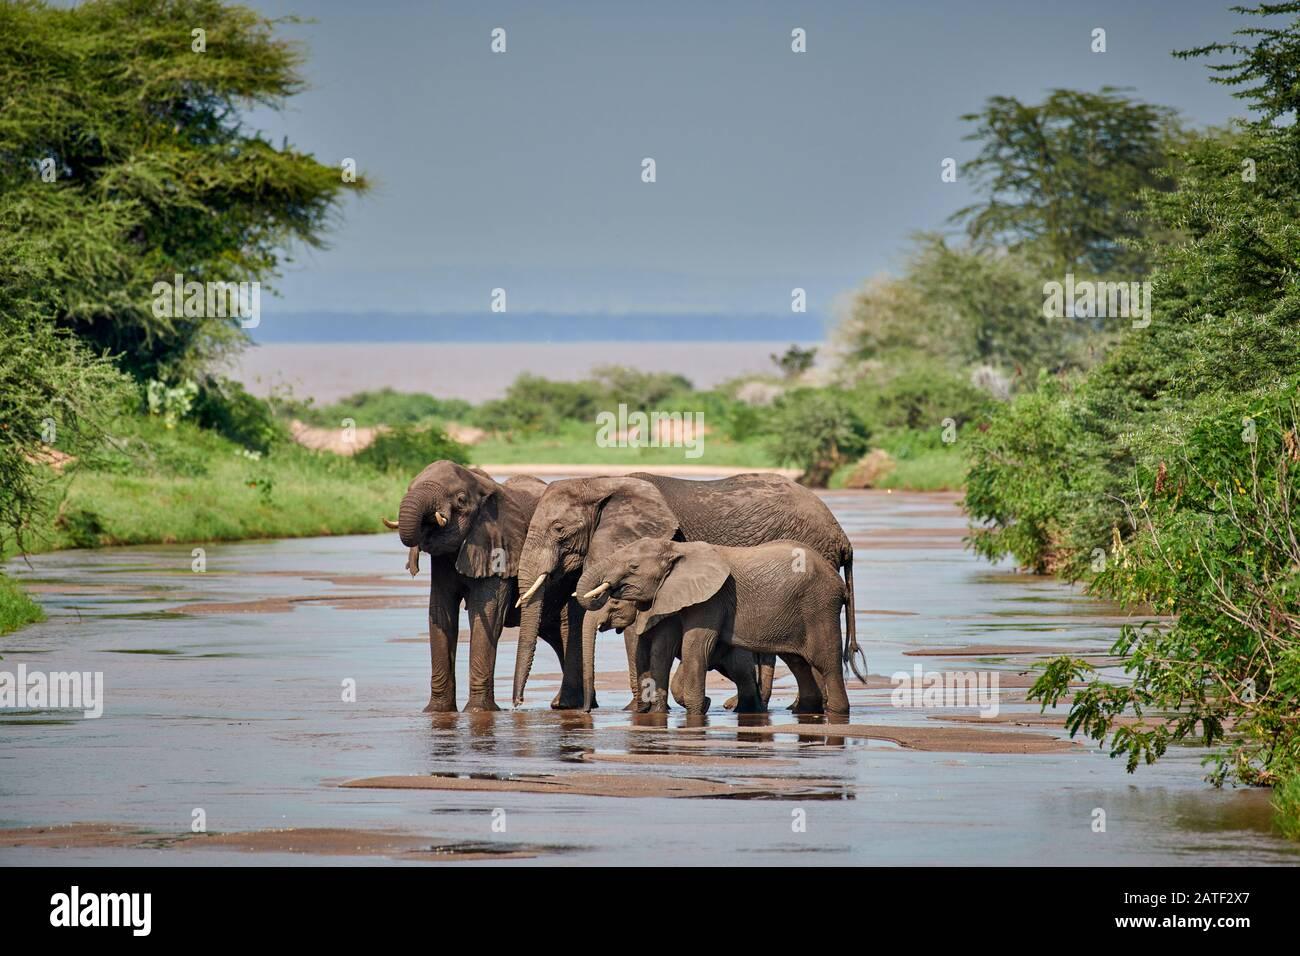 three African bush elephants, Loxodonta africana, standing in river in Manyara National Park, Tanzania, Africa Stock Photo